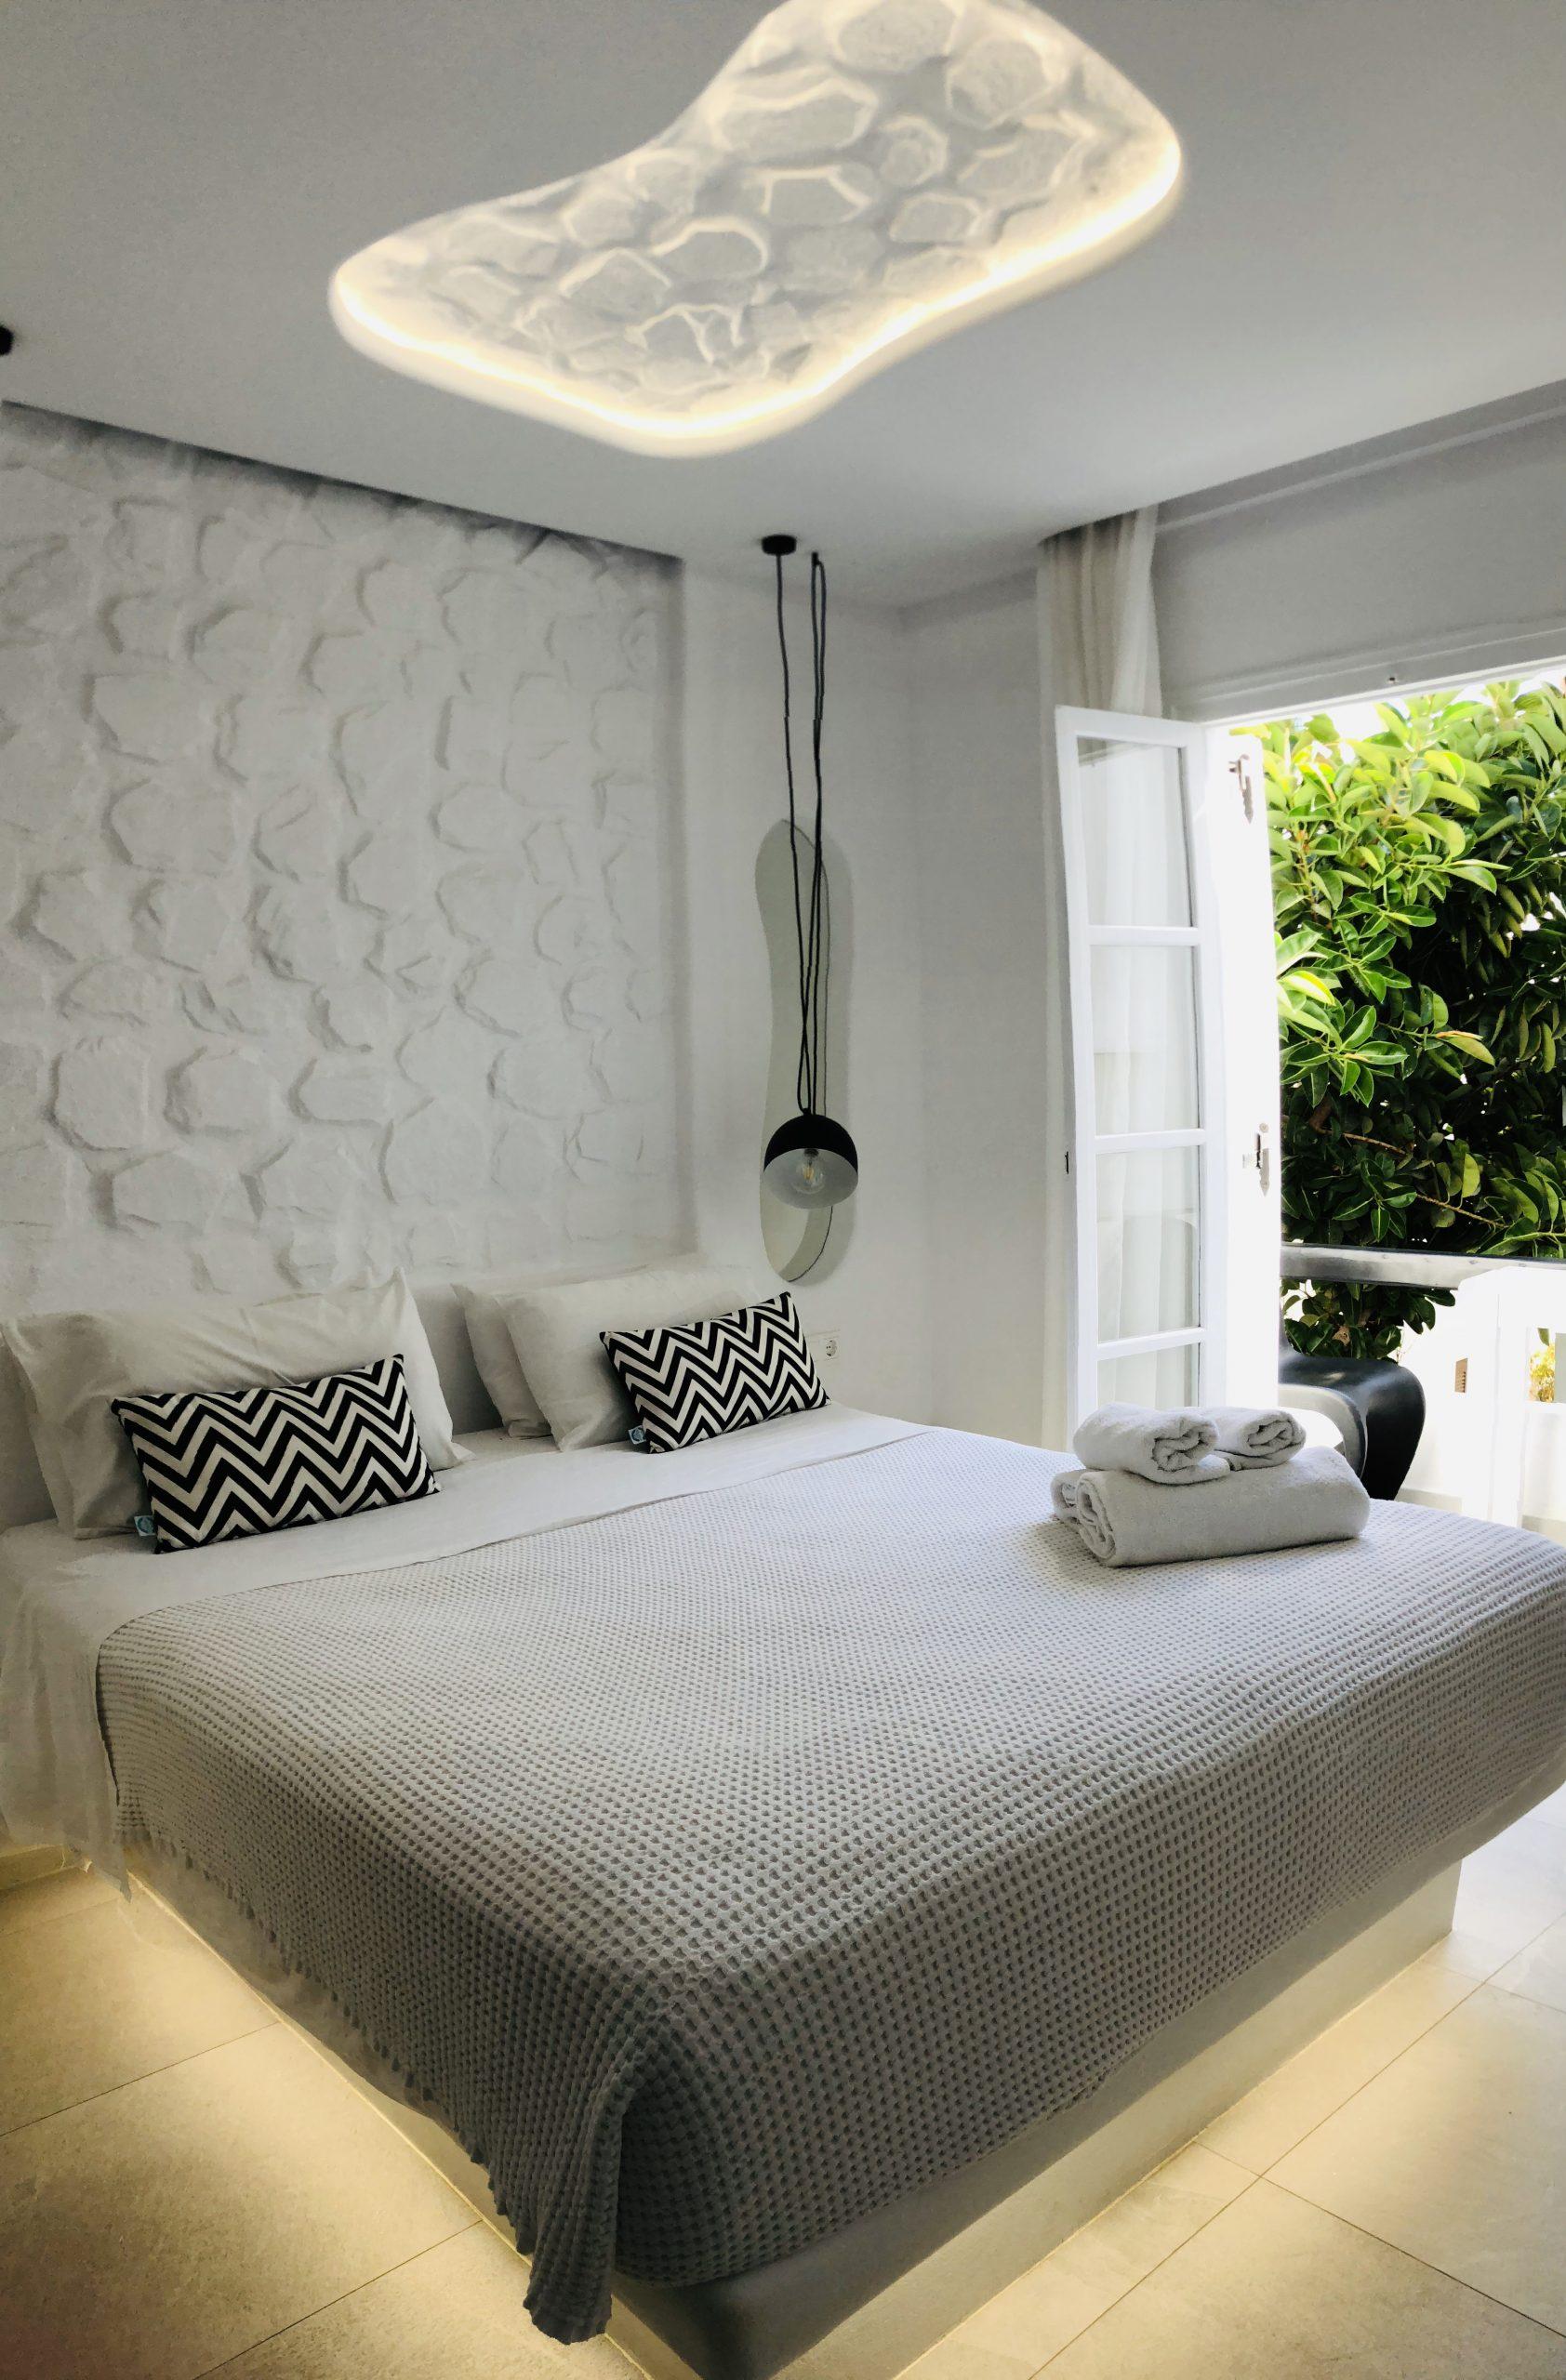 Studios Panos on Naxos Island Hospitality